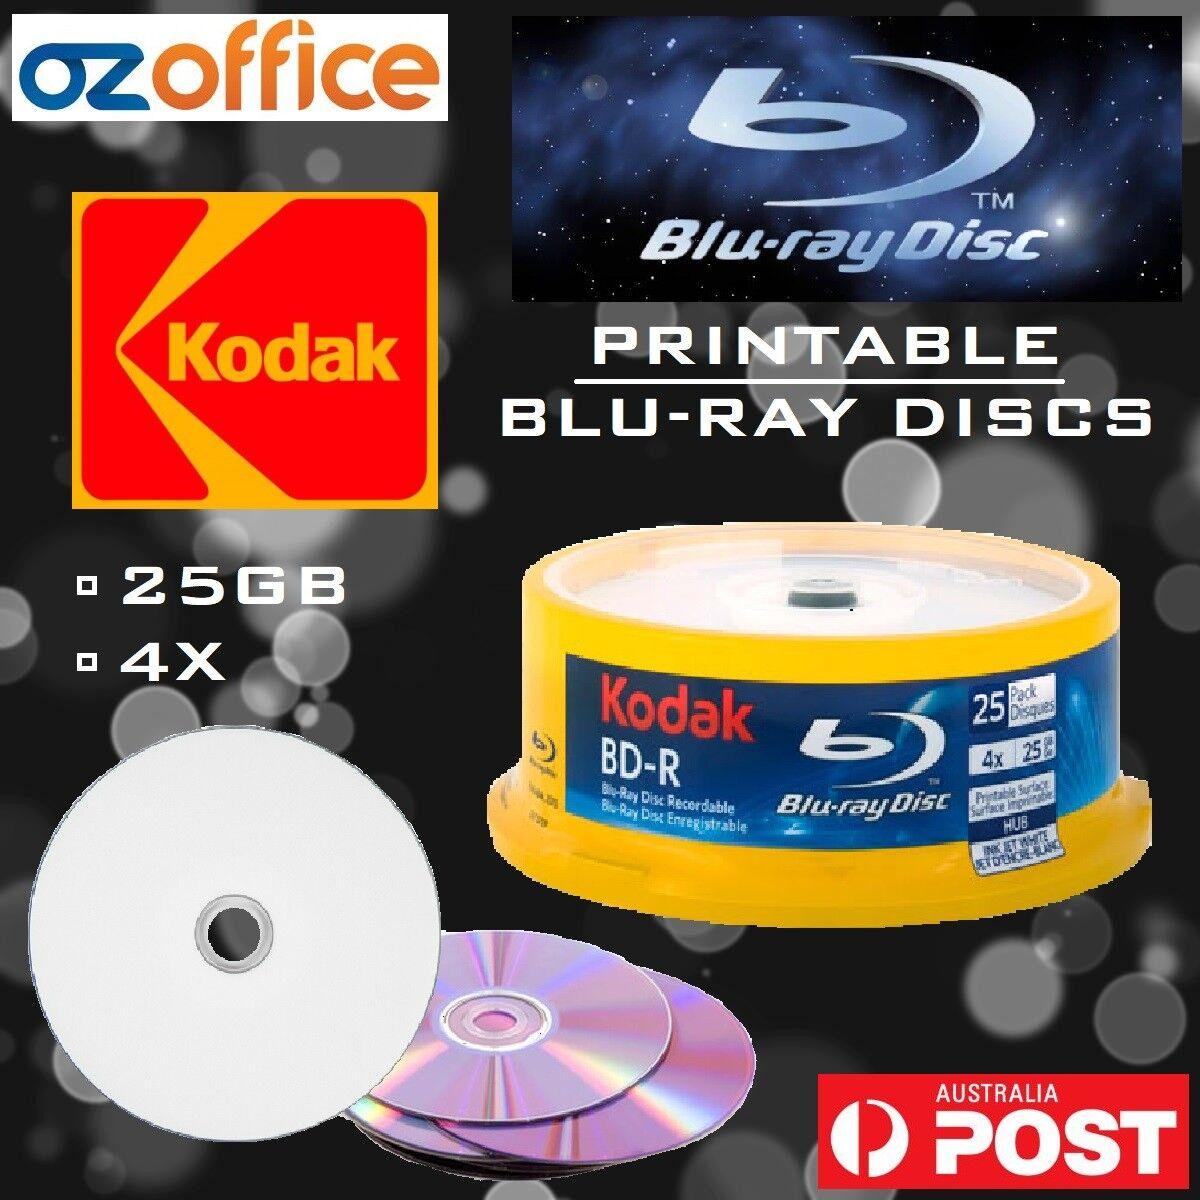 photograph about Printable Blu Ray Discs identify Information around KODAK Blank Blu-Ray Discs 25GB BDR 4X White Inkjet Printable Disc